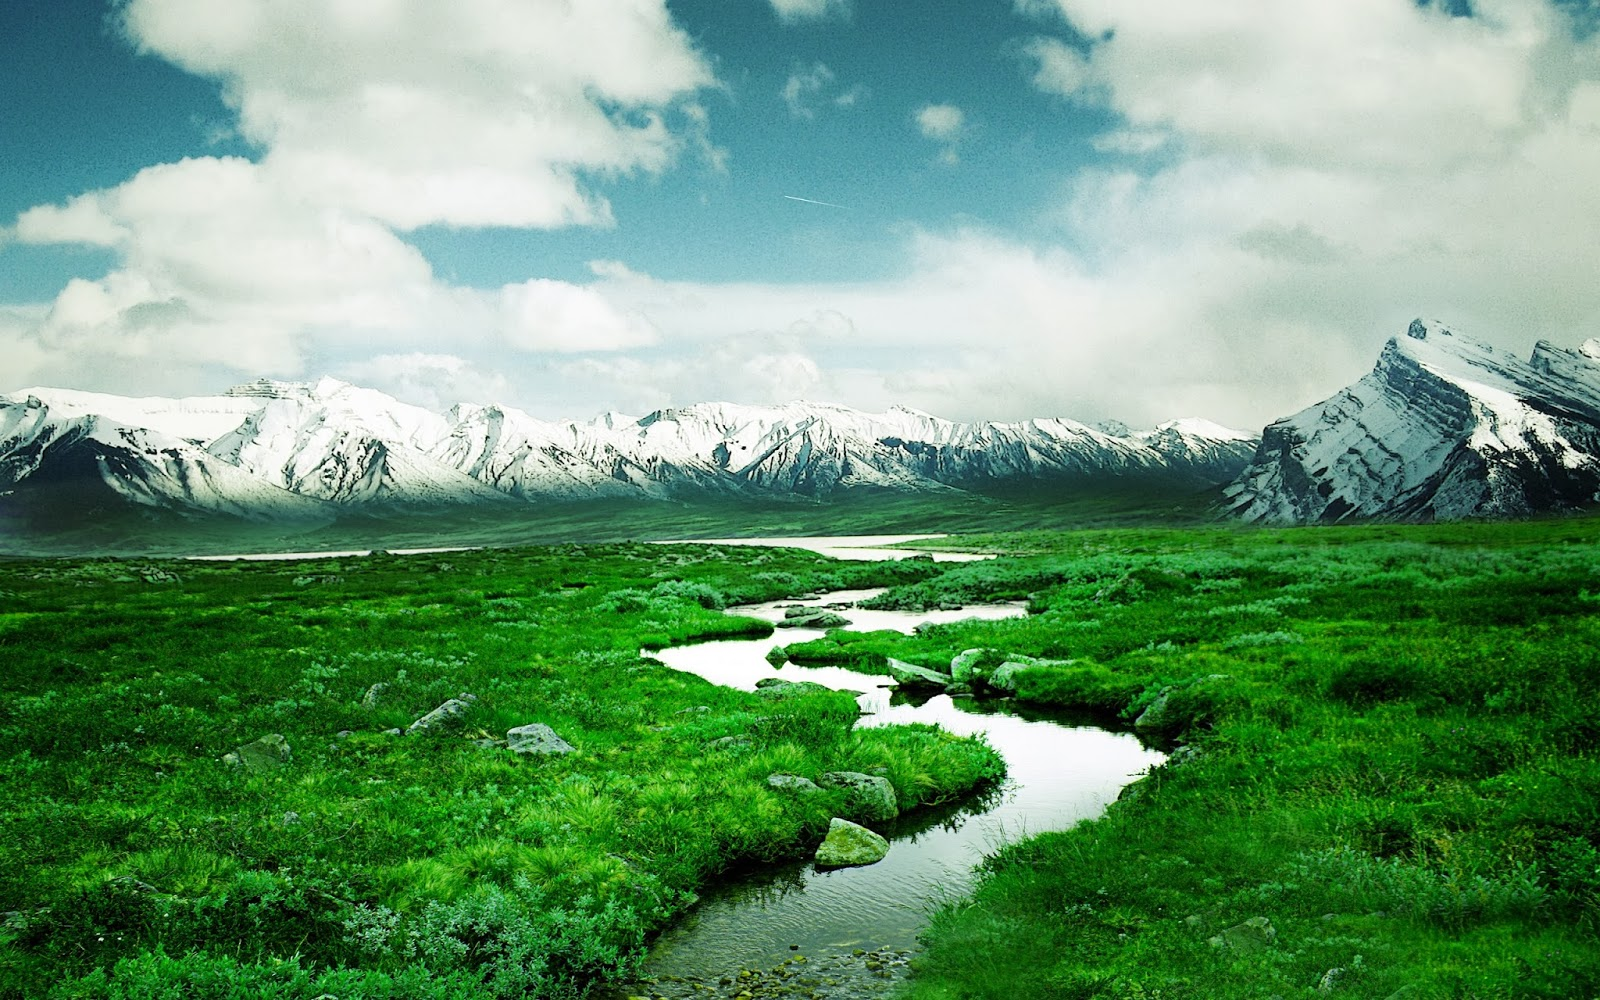 "<img src=""http://2.bp.blogspot.com/-U2se5fNPs9g/UuAWDfORPGI/AAAAAAAAJxE/Si48XrOlfX8/s1600/norway-mountain-river.jpg"" alt=""norway mountain river"" />"